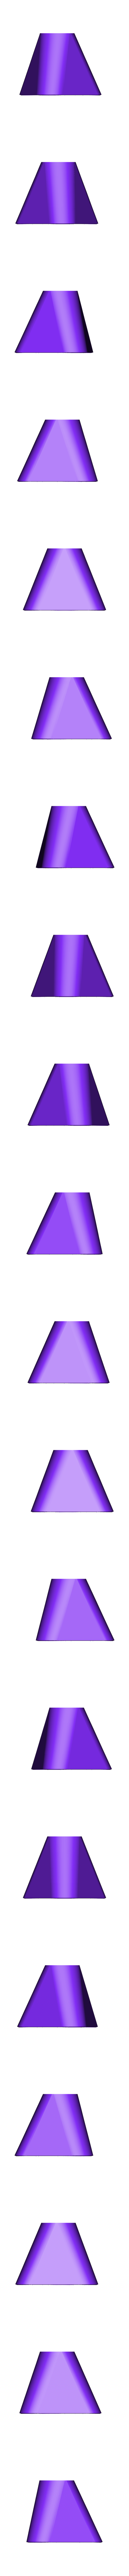 LIGHT_00_Print_HUB_B.stl Download free STL file Design Light_00 - MISSION TO MAKE  • Design to 3D print, DistributedDesign